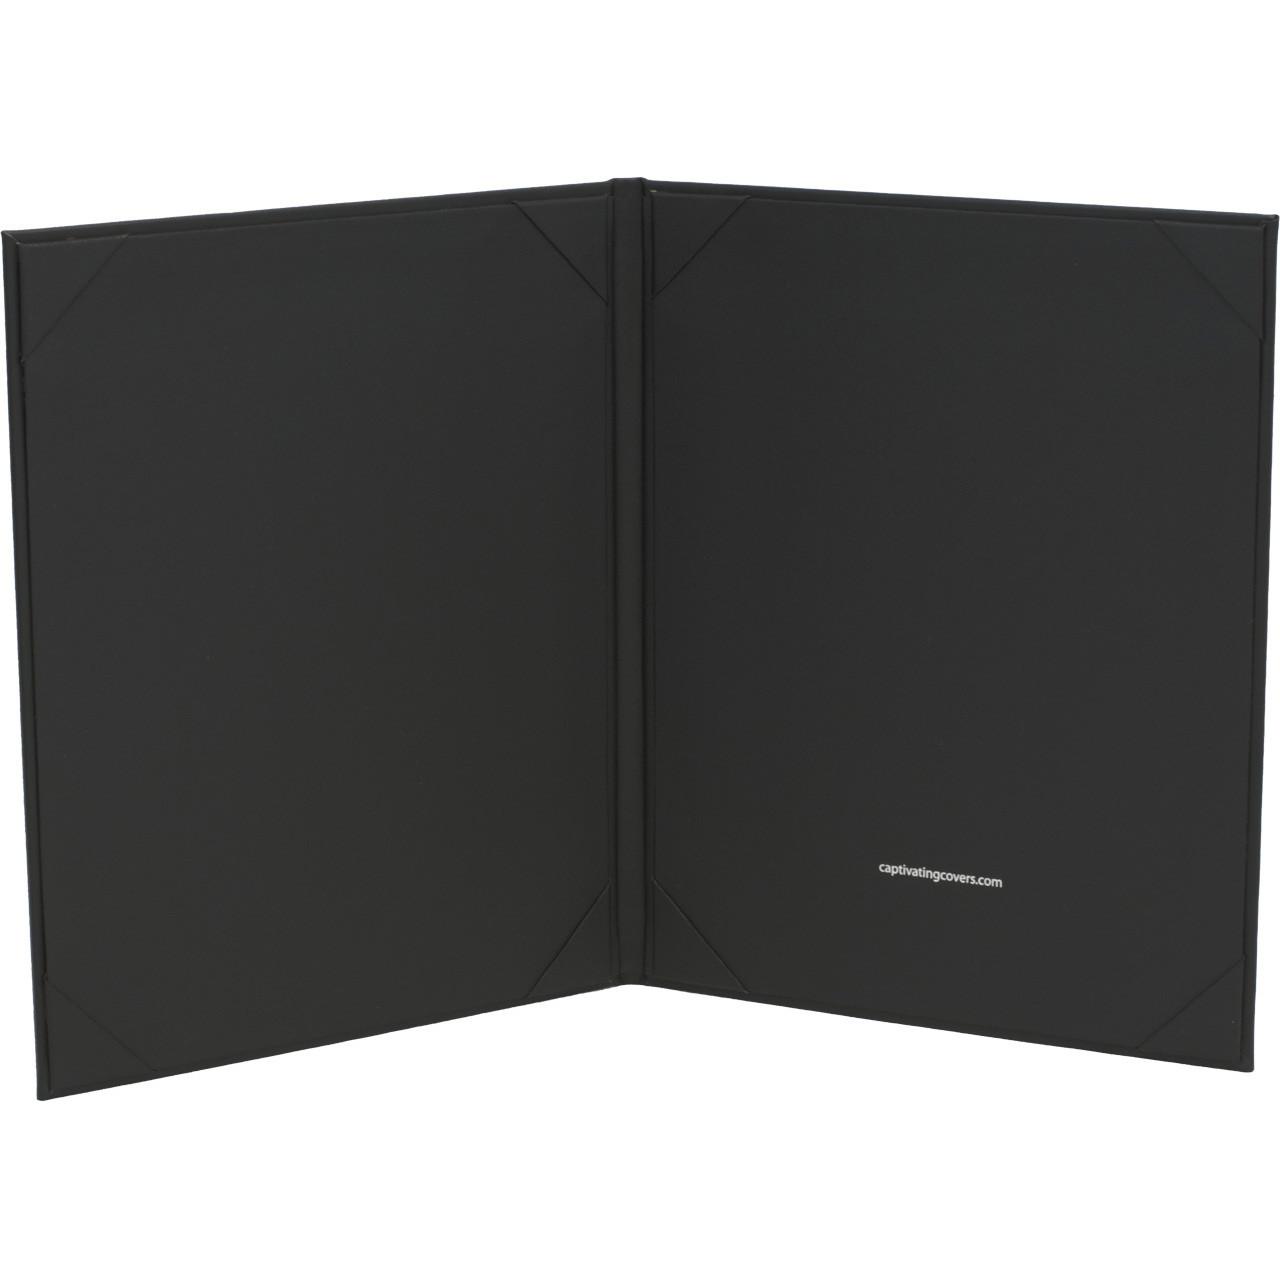 "8 1/2"" x 11"" Insert Menu Cover 2-panel black, inside"